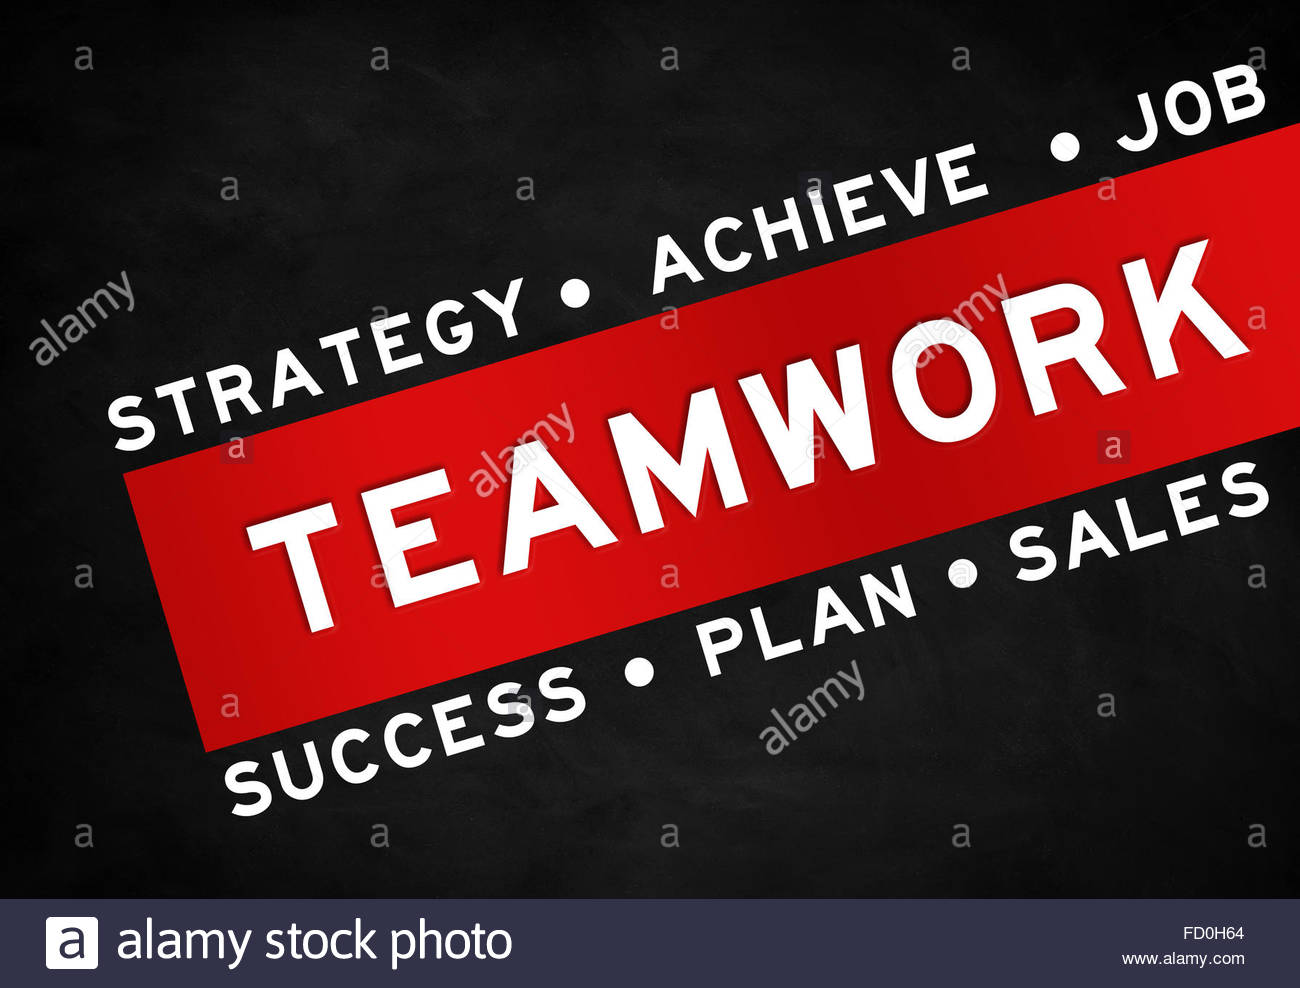 Teamwork concept advertising - Stock Image